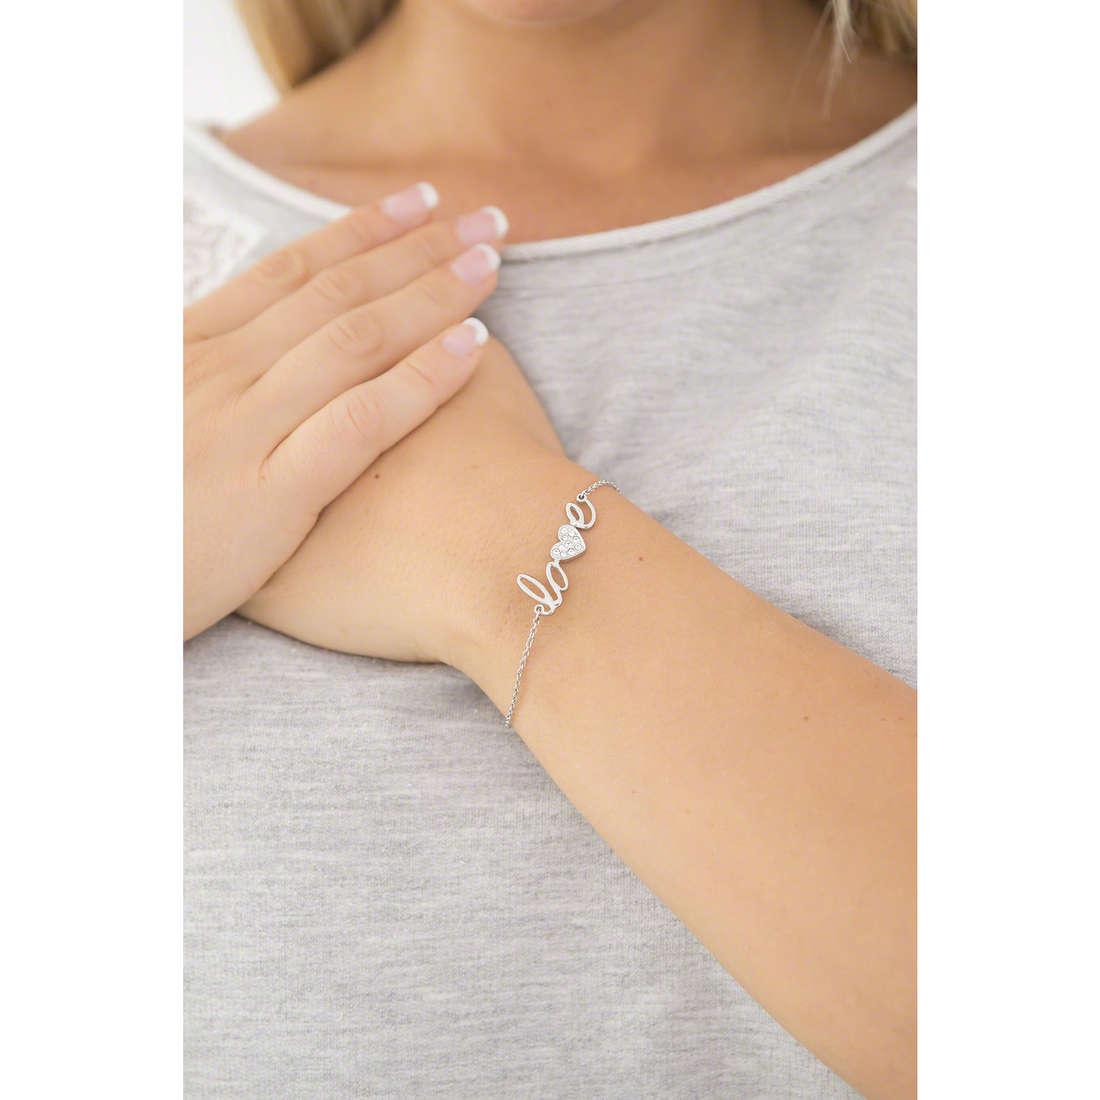 Morellato bracciali I-Love donna SAEU05 indosso